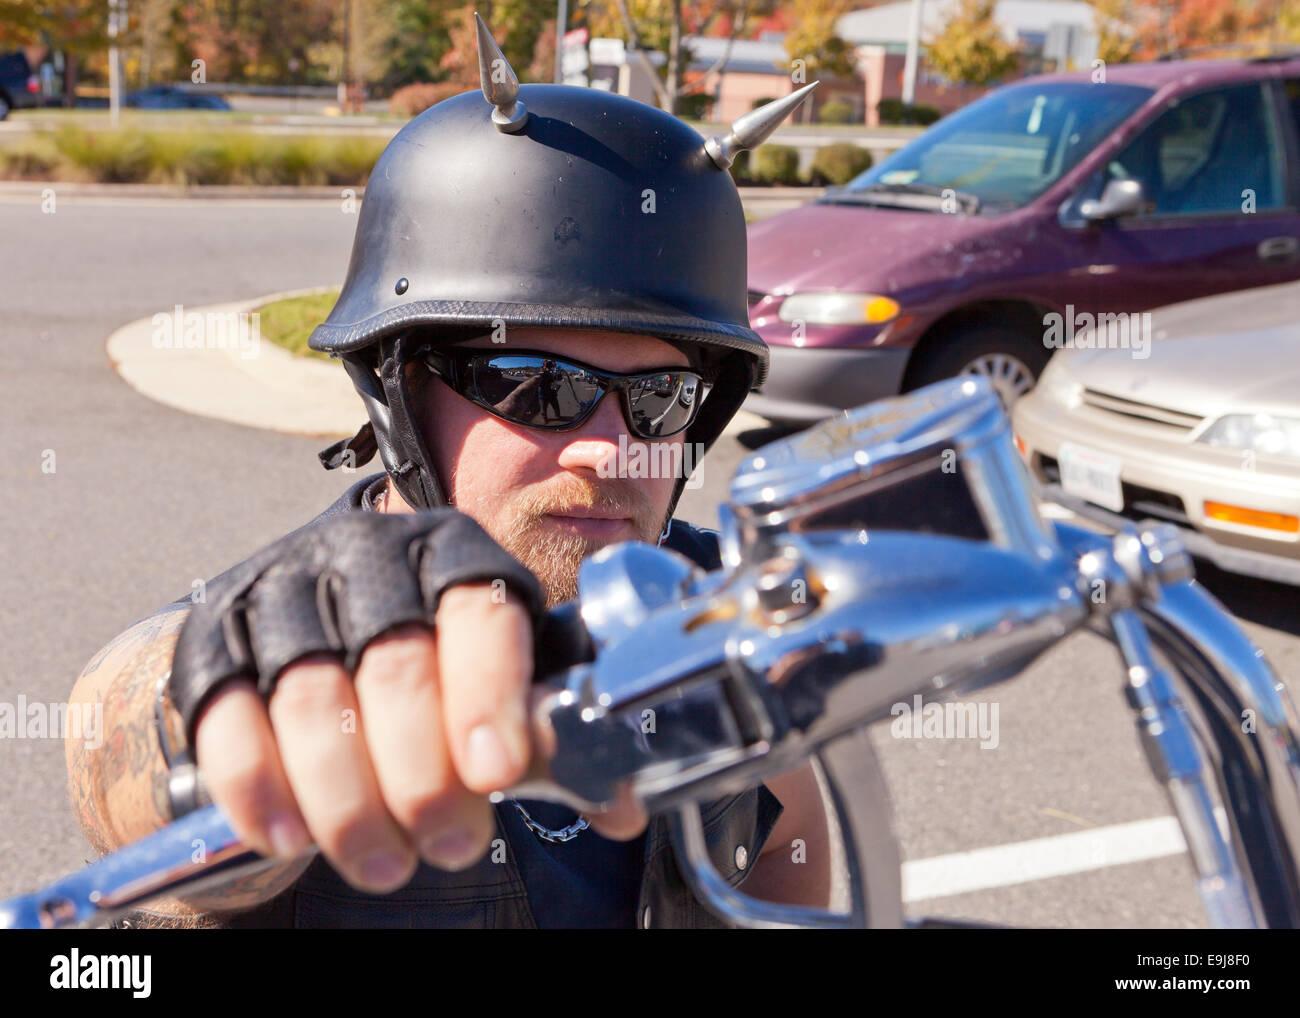 Rider on Harley Davidson chopper motorcycle - Virginia USA - Stock Image